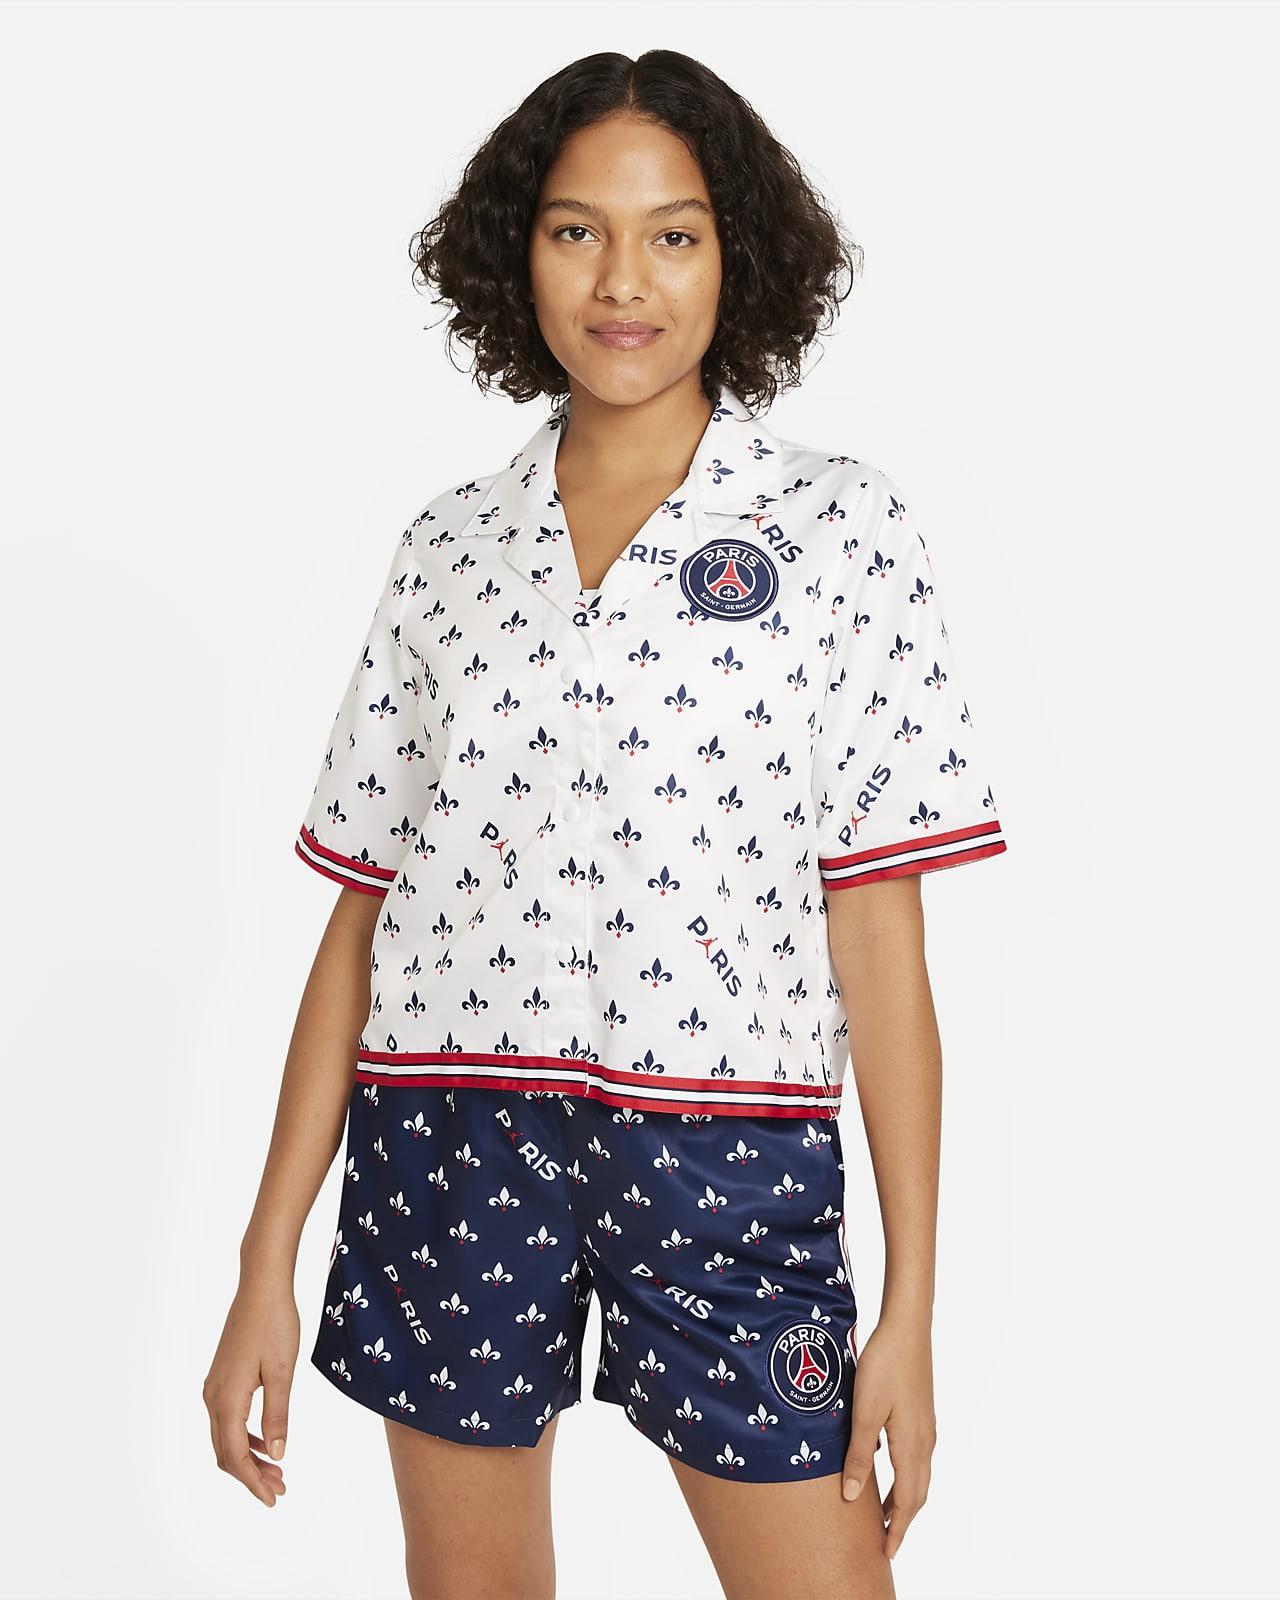 Paris Saint-Germain Women's Short-Sleeve Printed Top